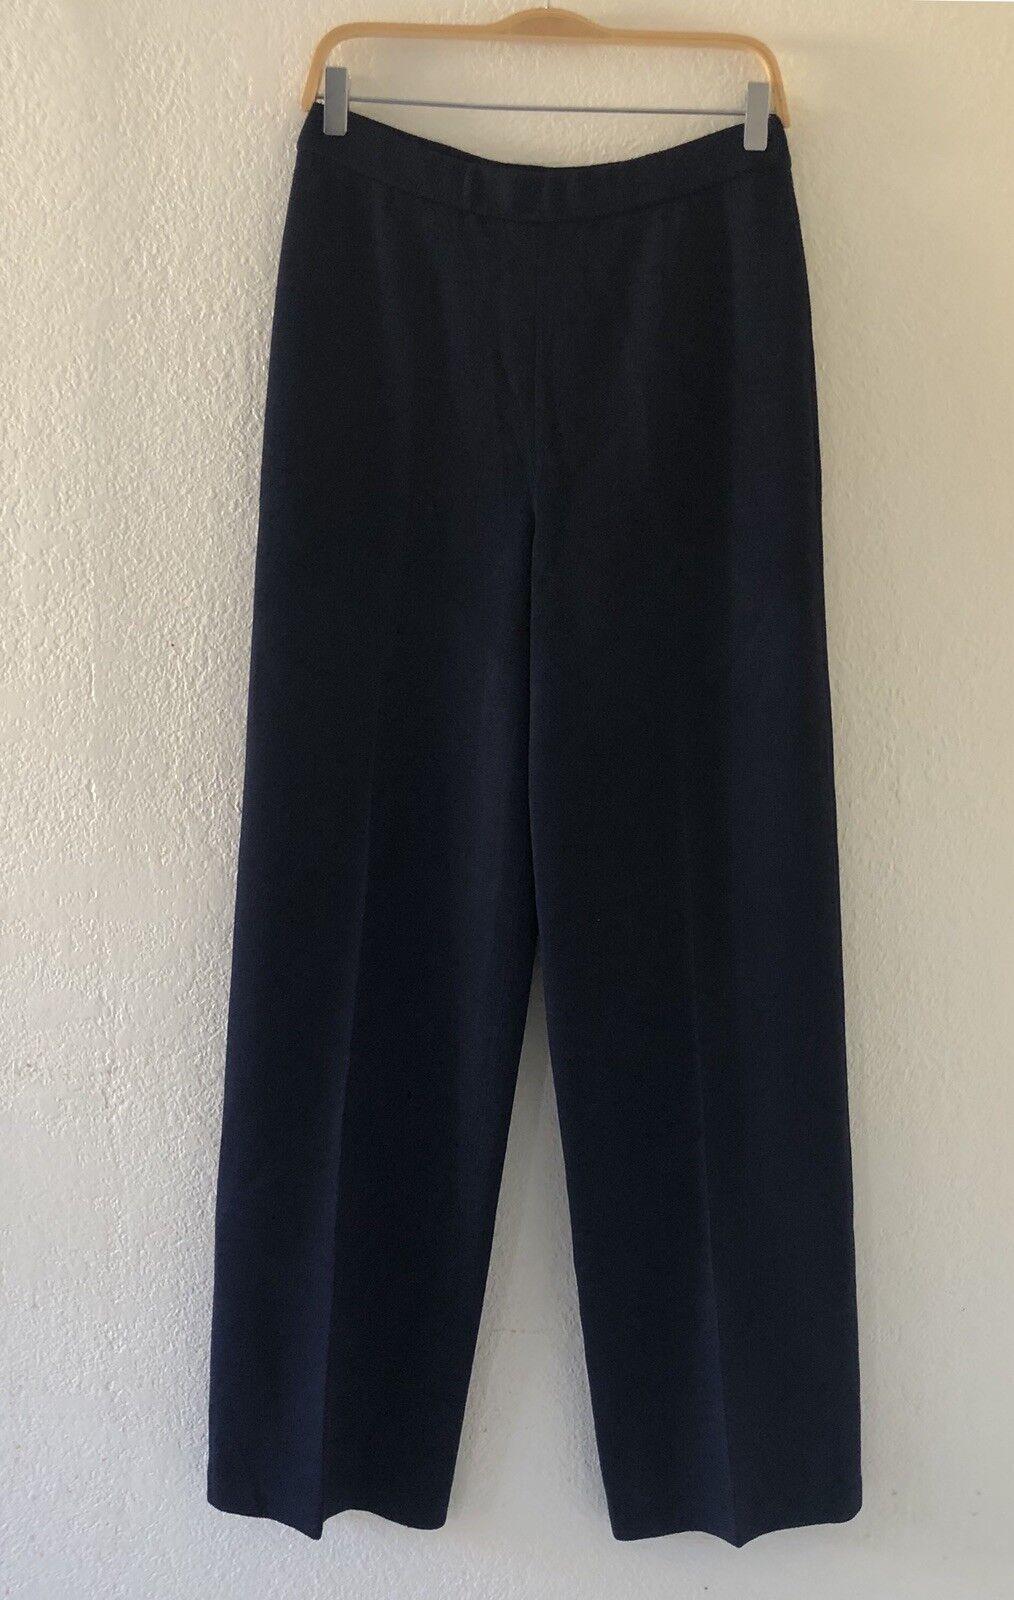 St John Collection Navy bluee Santana Knit Pant Size 8 Elastic Waist